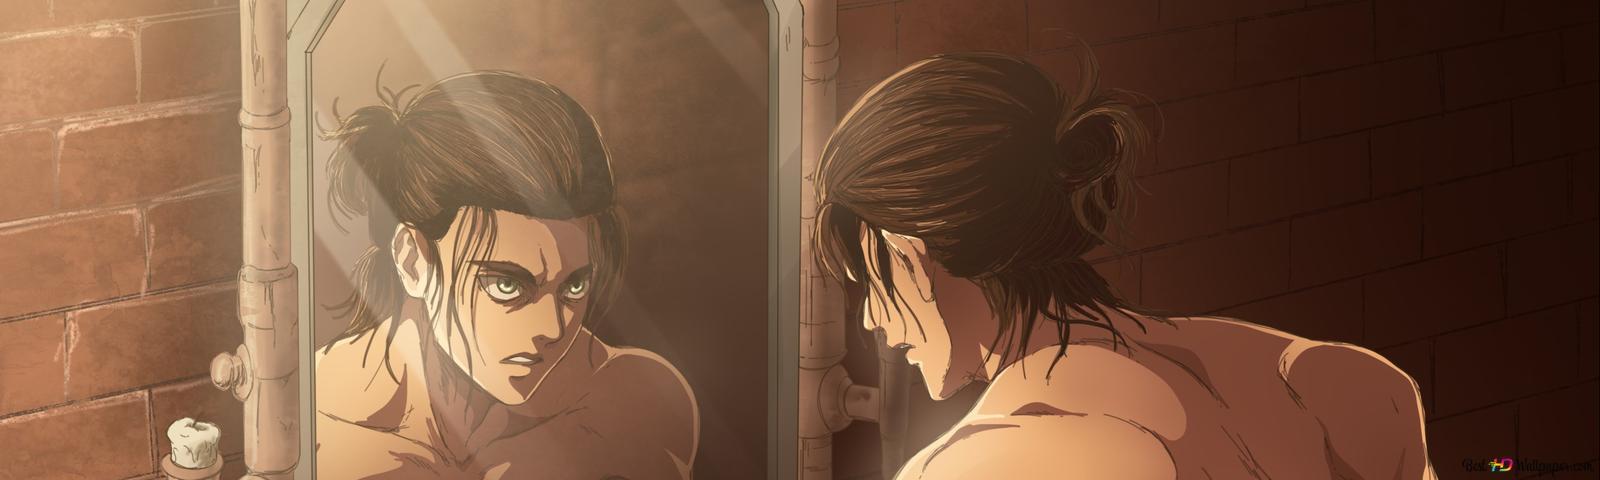 Attack On Titan Eren Yeager Timeskip Hd Wallpaper Download